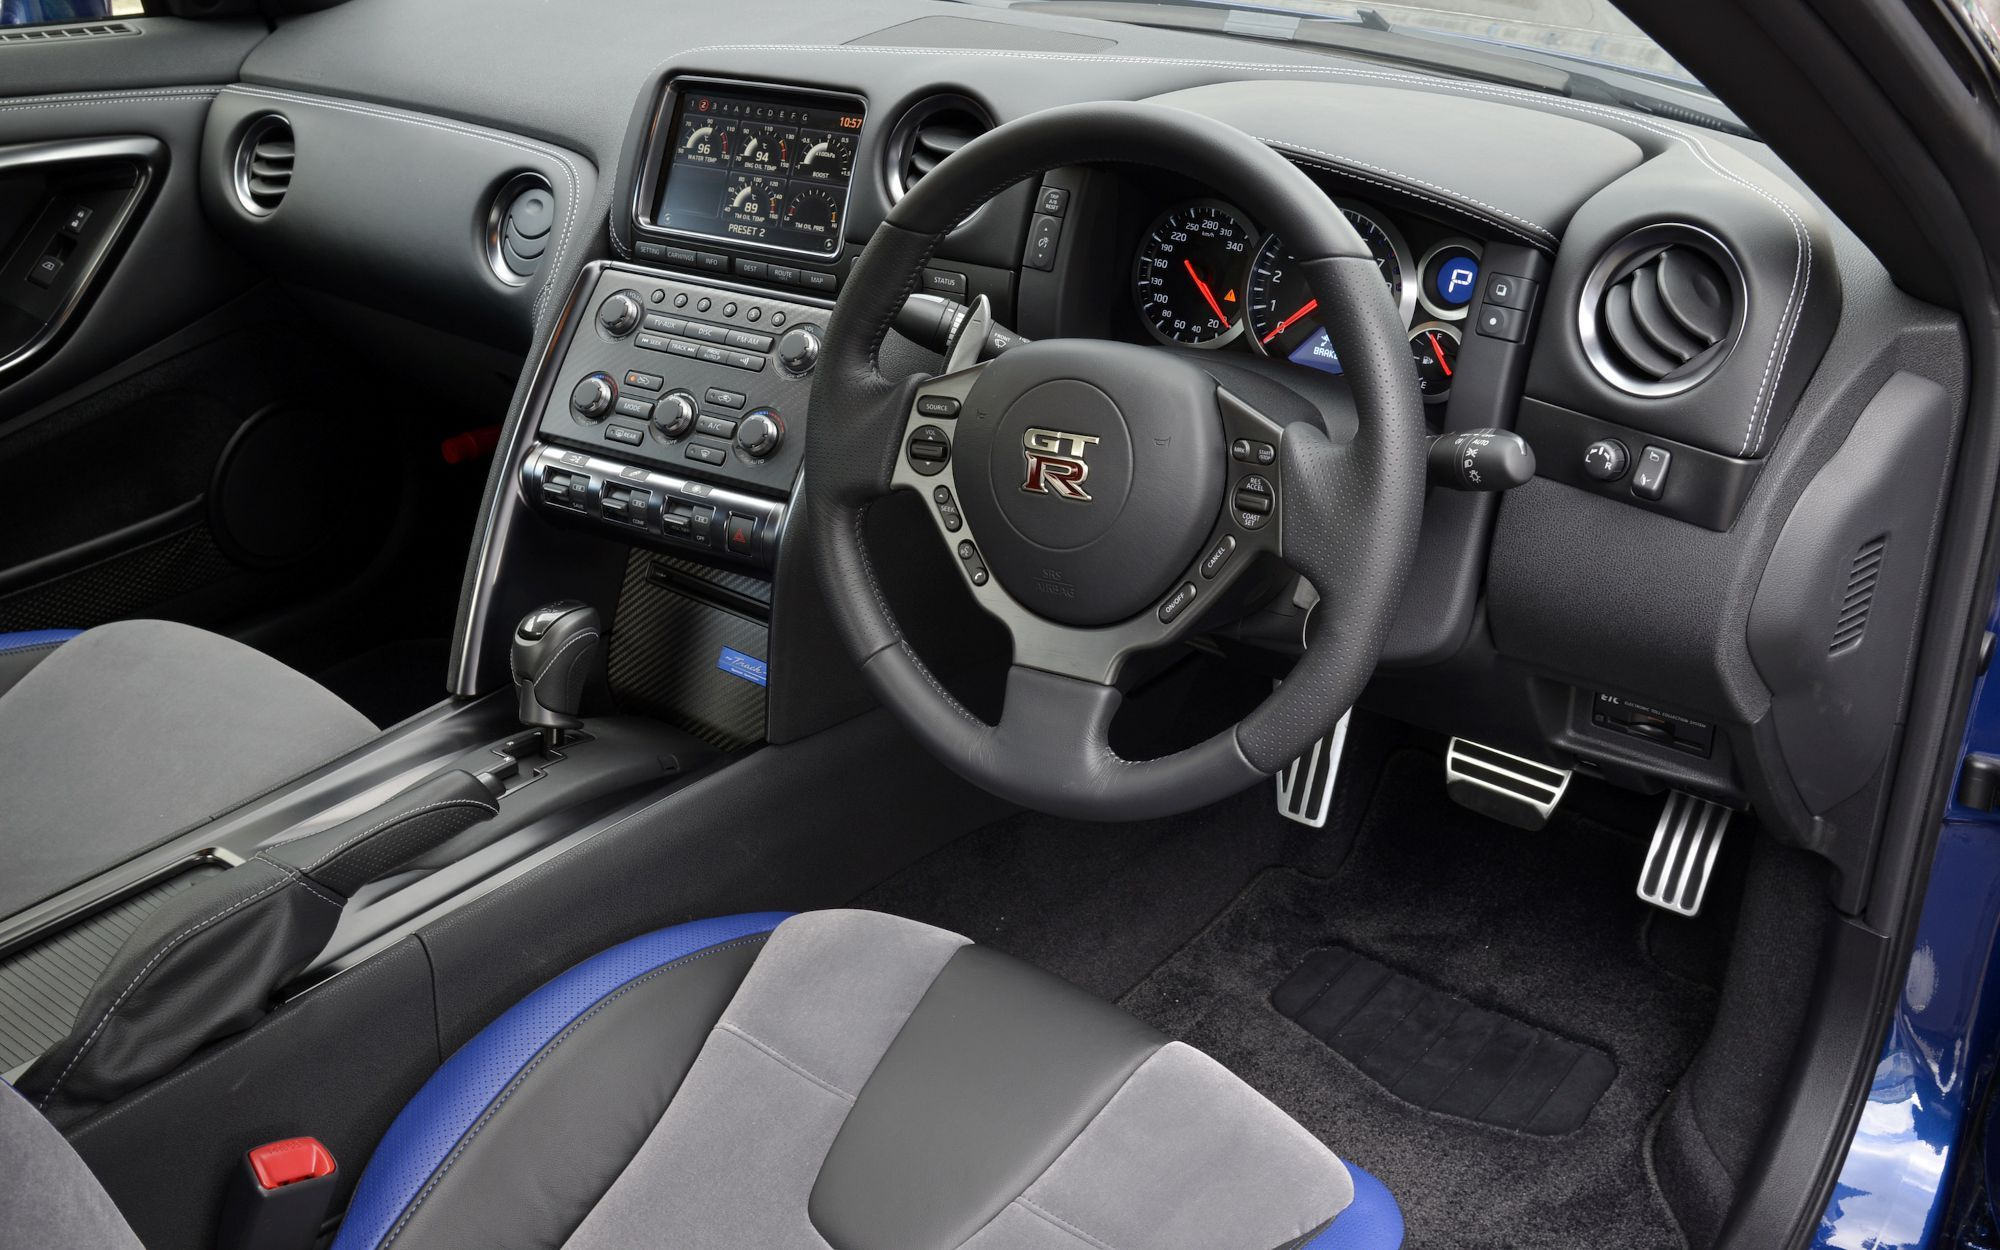 Nissan Gtr Interior >> Nissan Gtr Interior Google Search Gtr Nissan Gtr R35